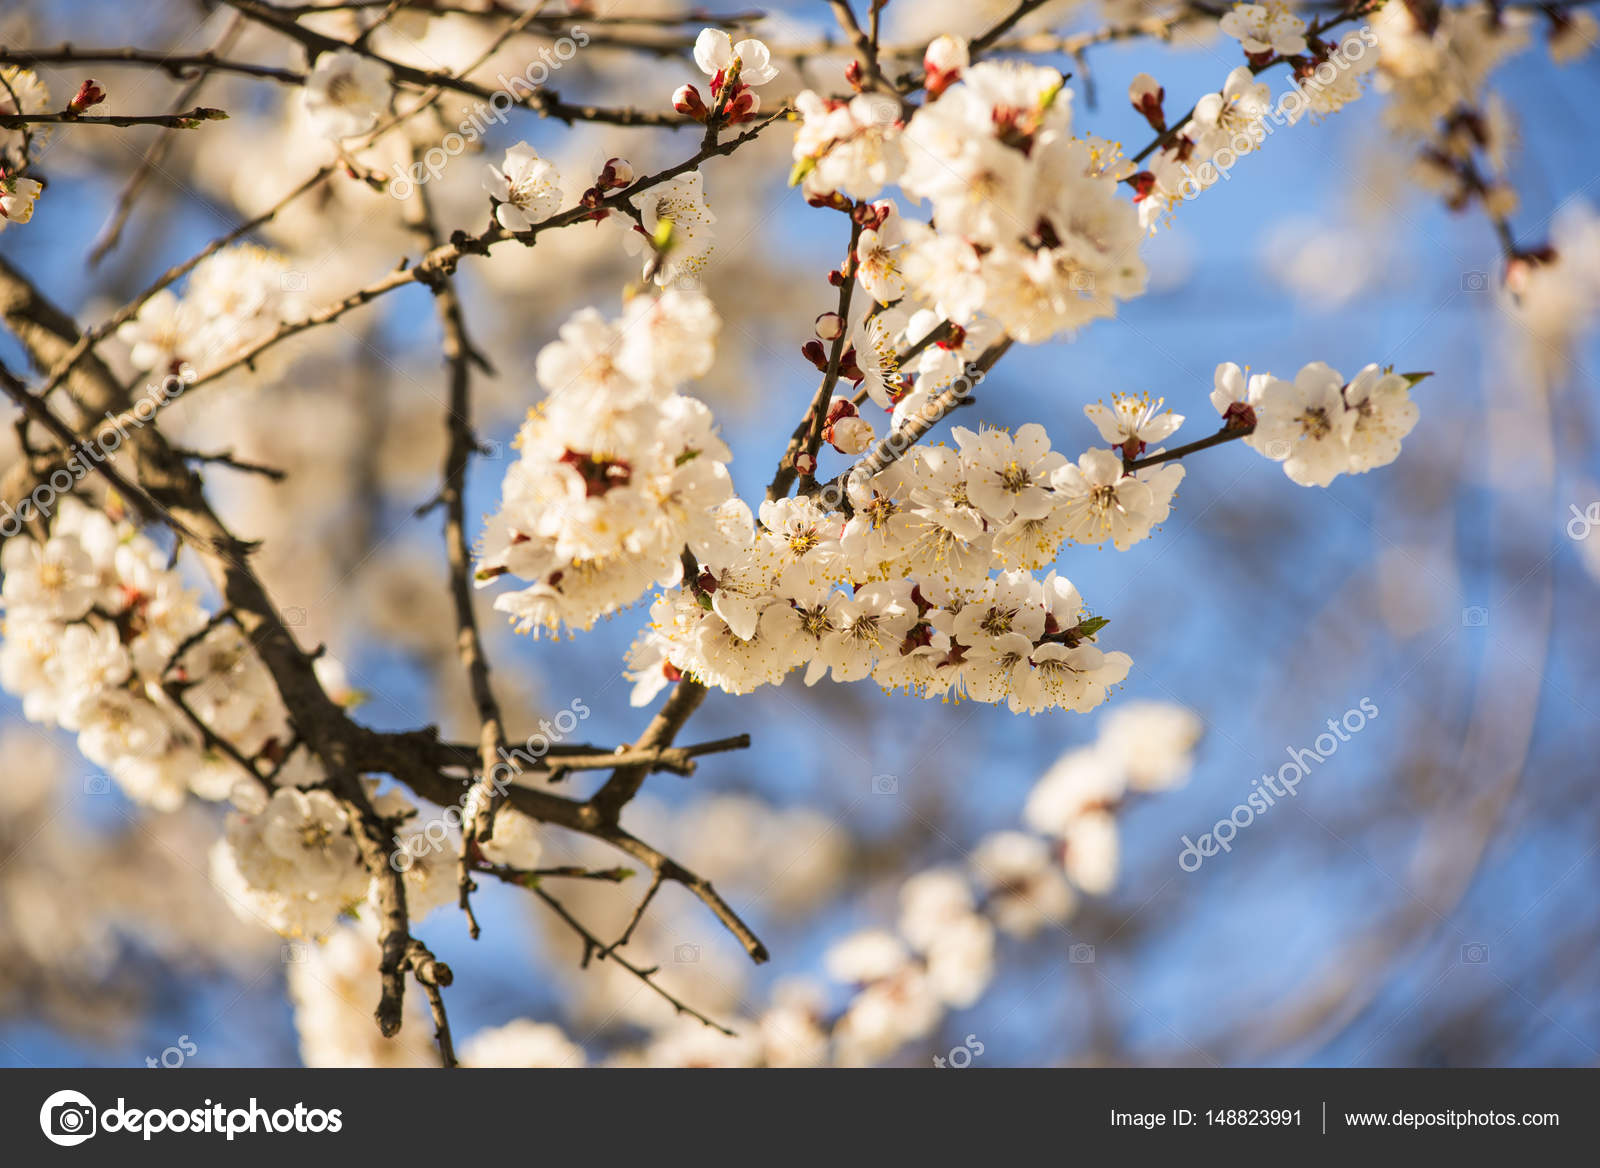 Apricot Or Cherry Blossom Flower Full Bloom In Blue Sky Spring